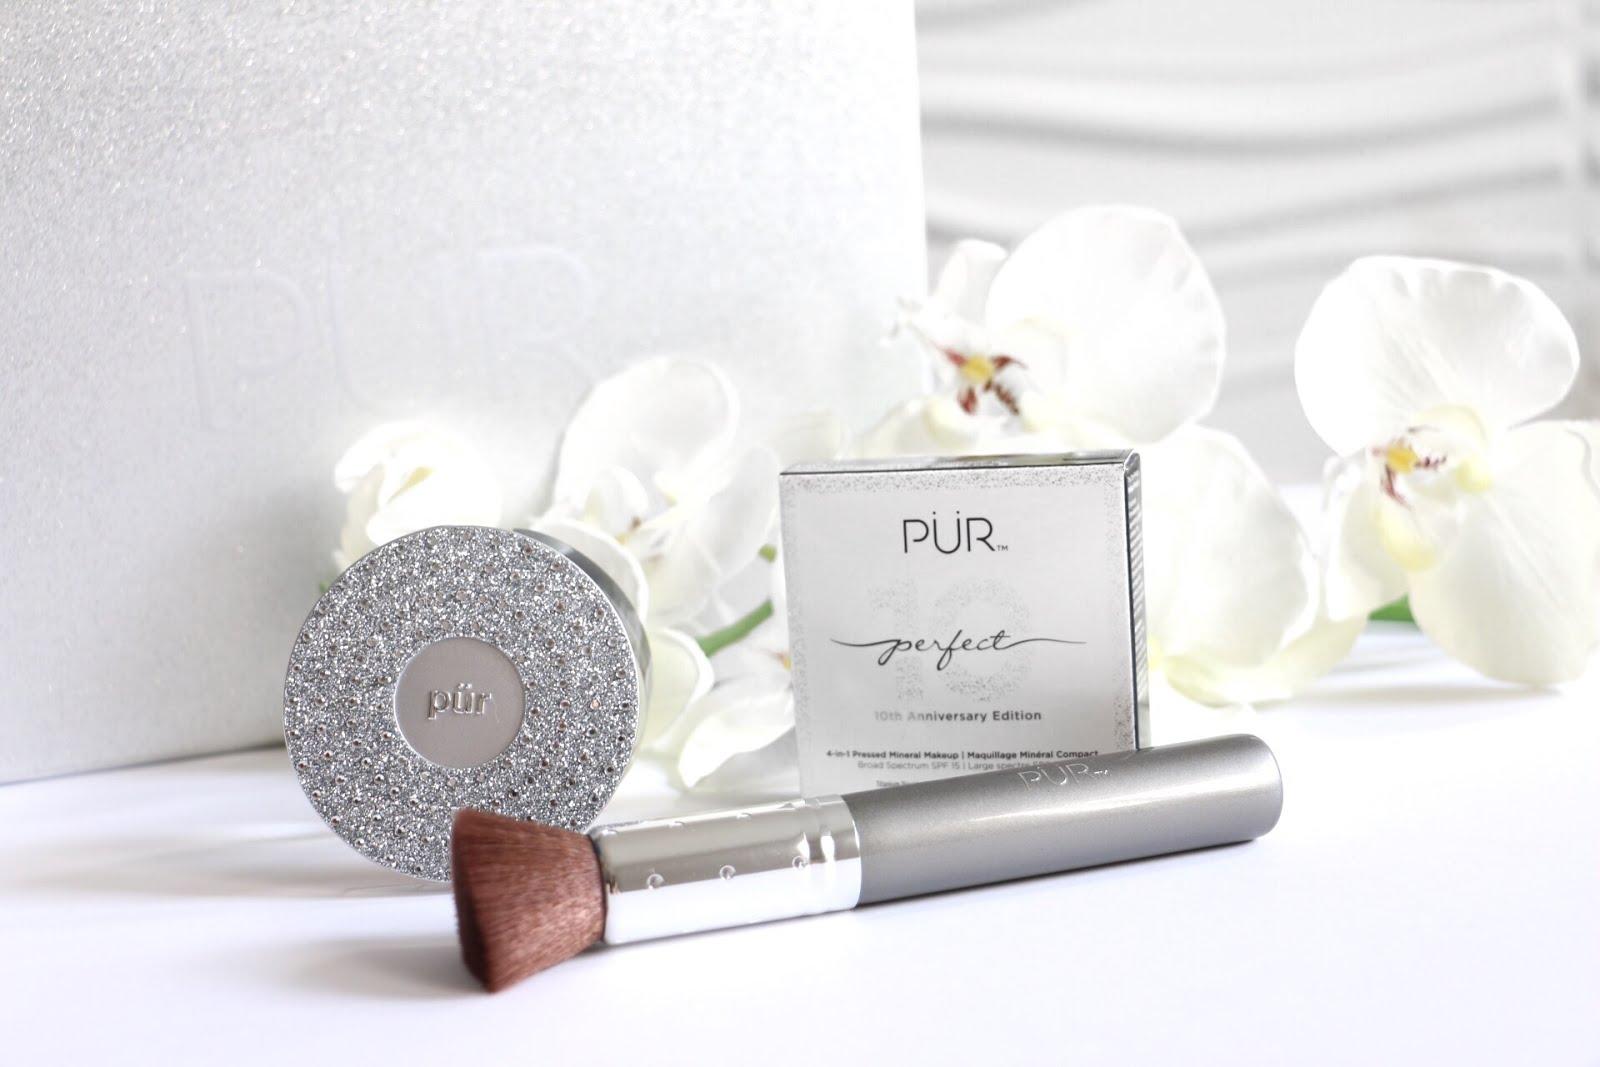 Pur-Cosmetics-4-In-1-Pressed-Mineral-Makeup-Foundation-Vivi-Brizuela-PinkOrchidMakeup